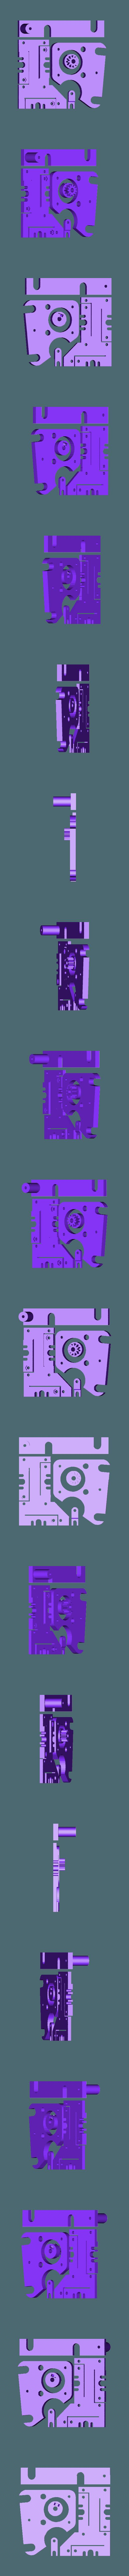 Tray-2.stl Download free STL file RepRapPro Mendel Trays • 3D printable model, Nessun_Dorma